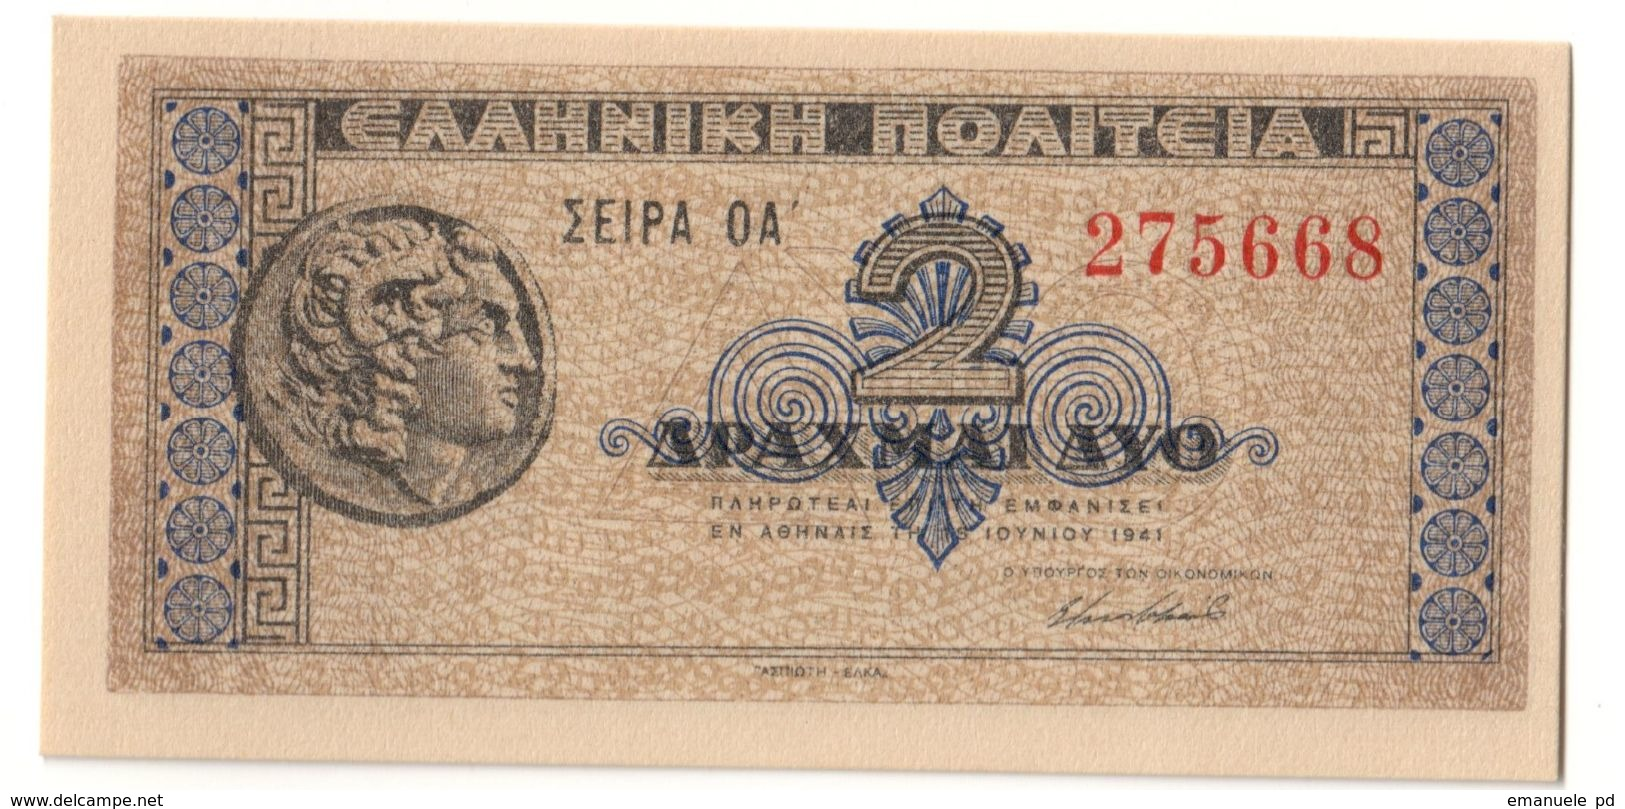 GREECE2DRACHMAI18/06/1941P318UNC.CV. - Grèce